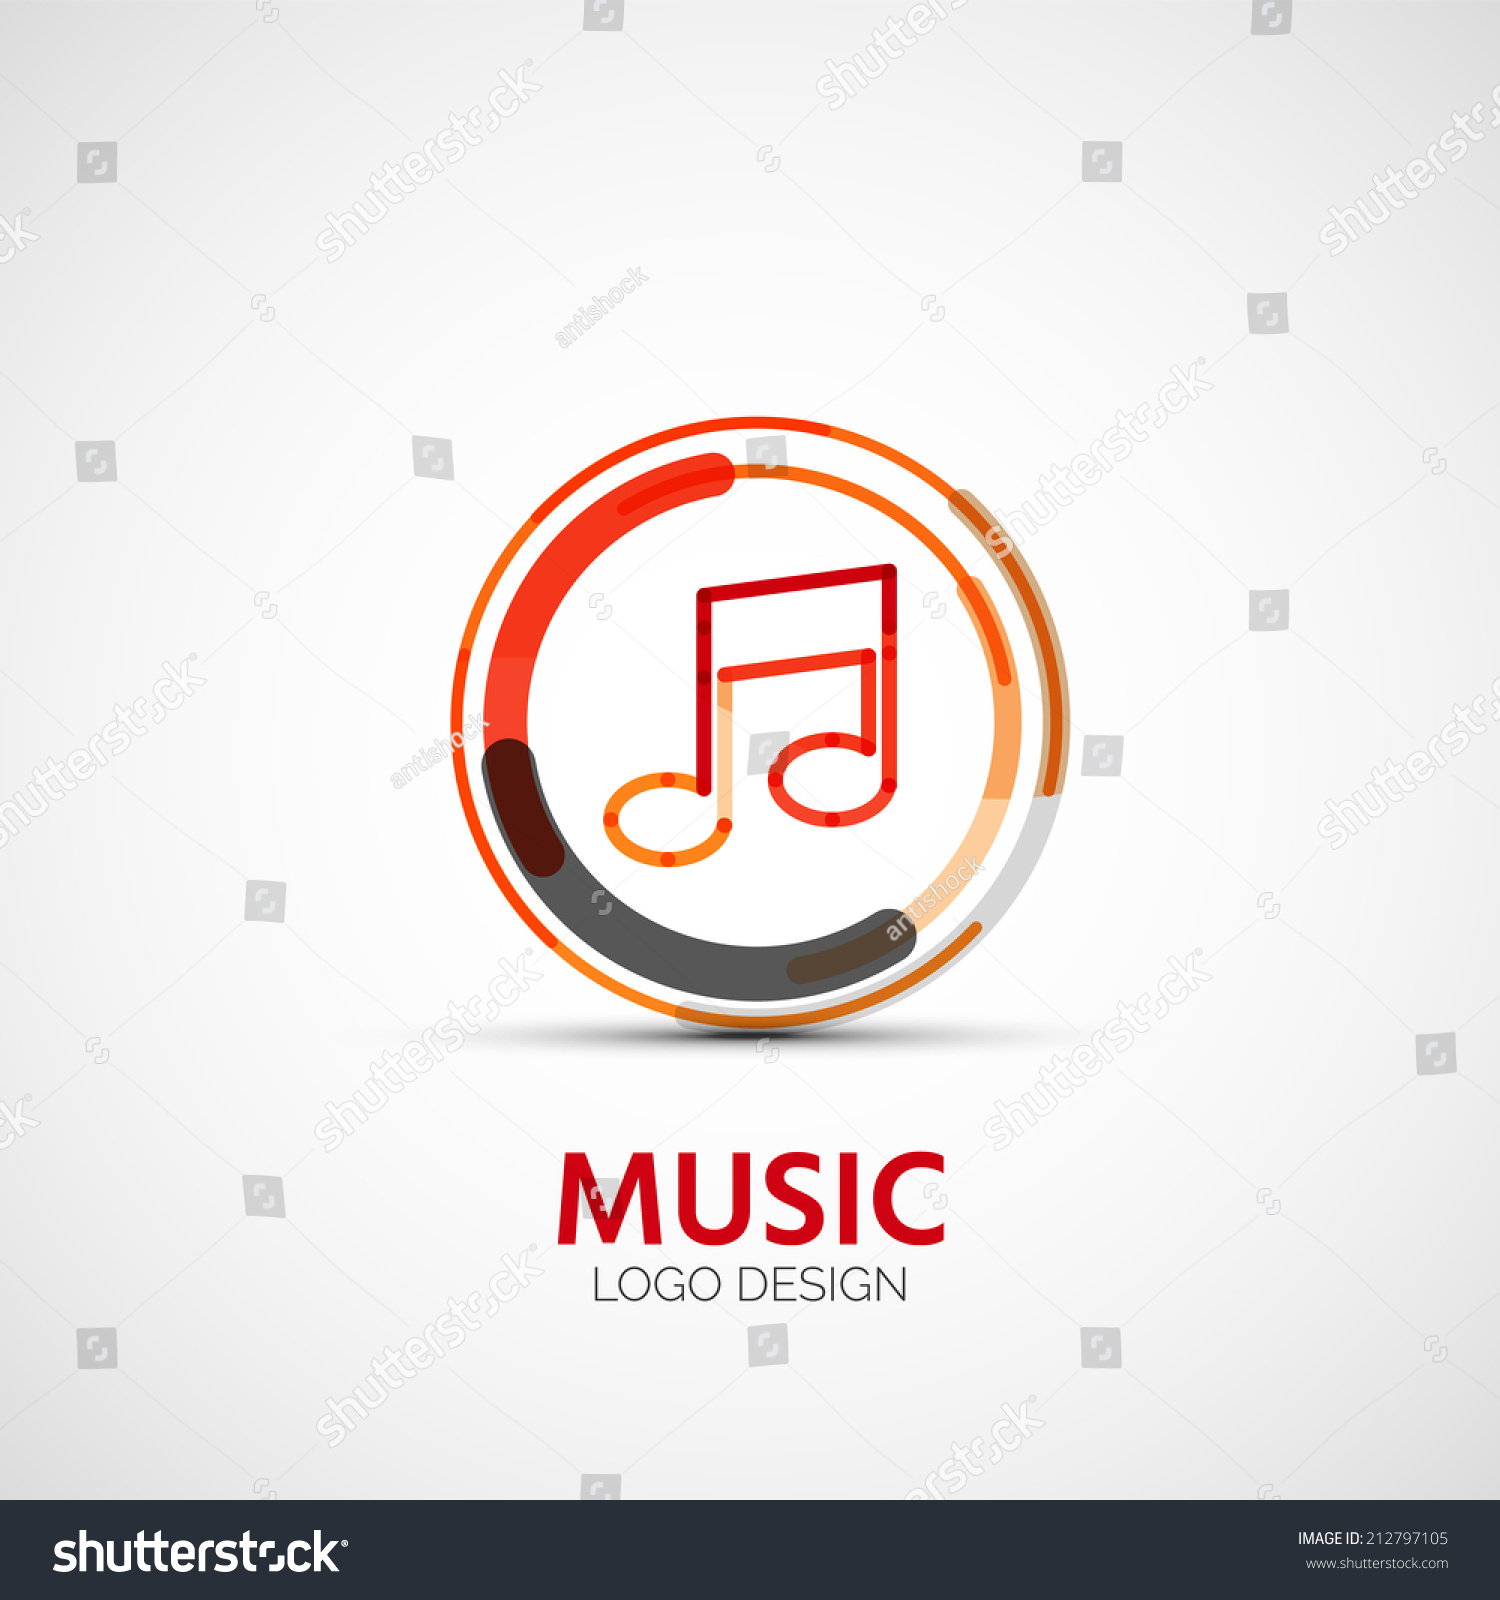 music company logo design, business symbol concept, minimal line design #212797105